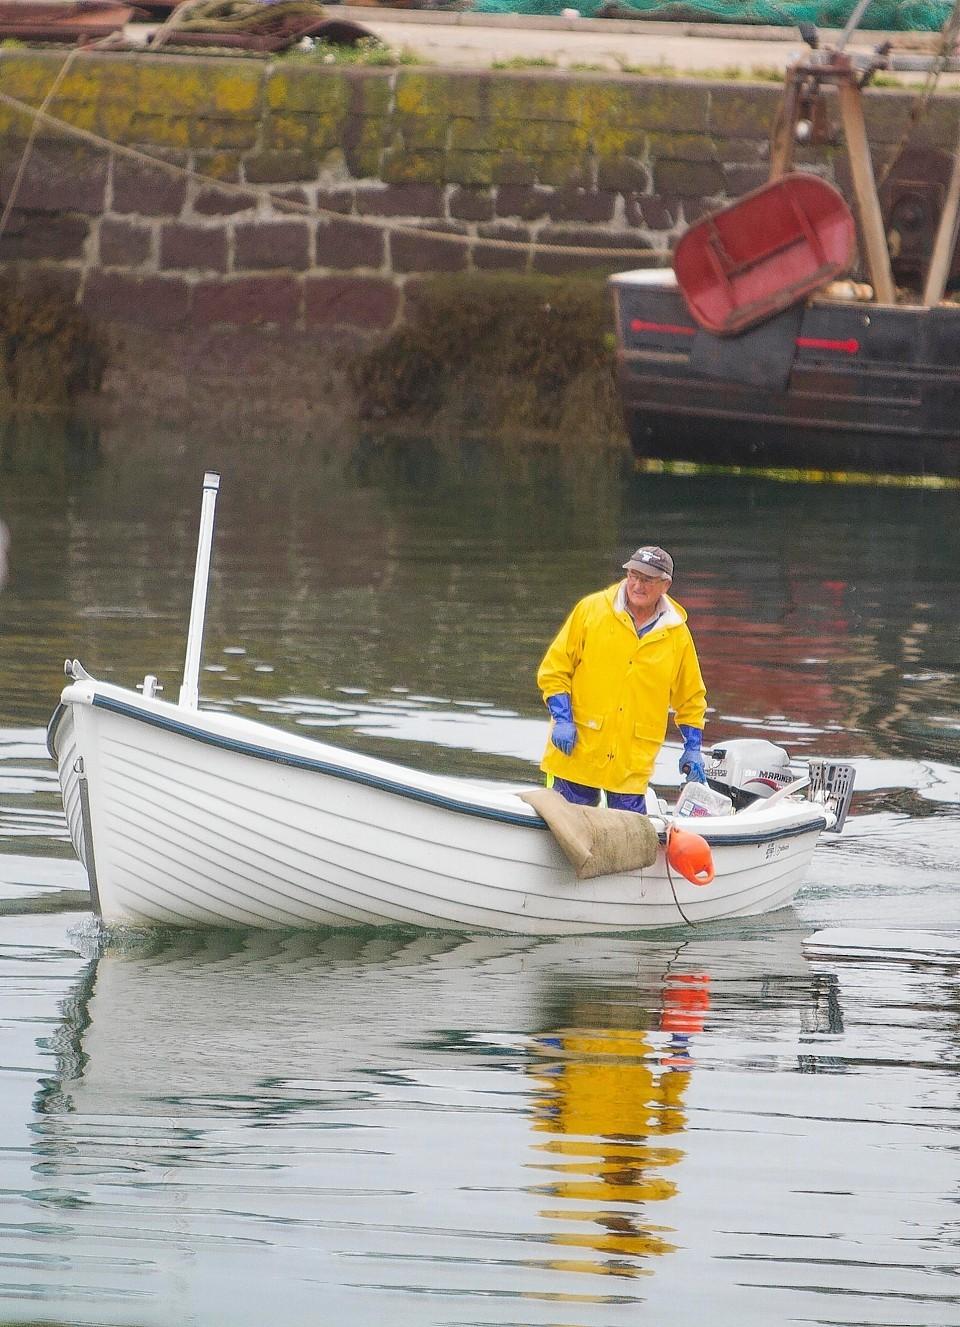 Jim Reid in his new boat